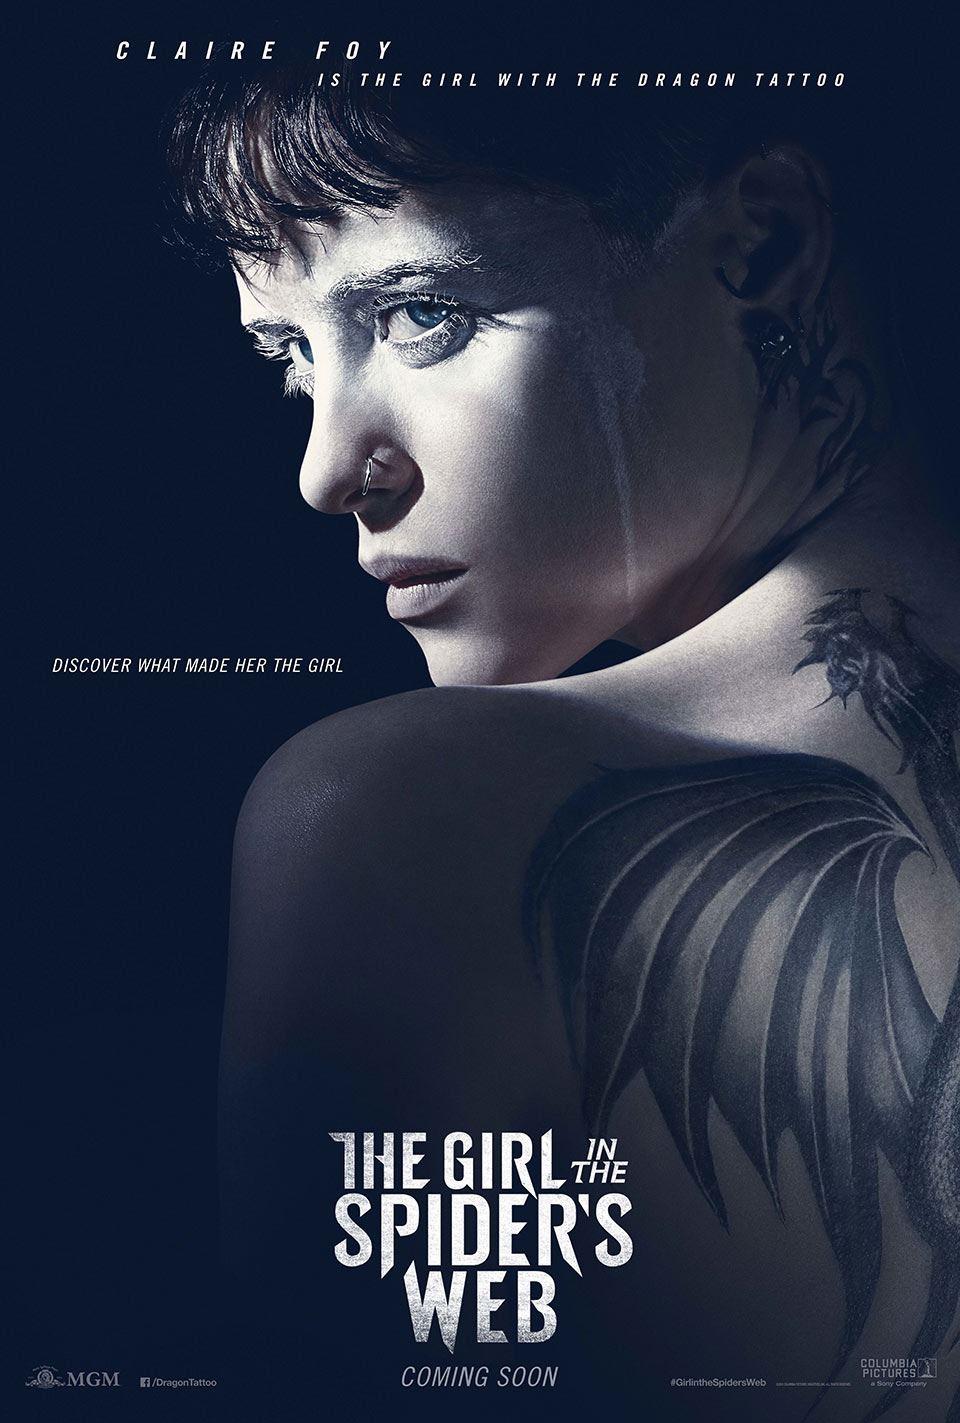 Bio på Forum - The girl in the spider's web